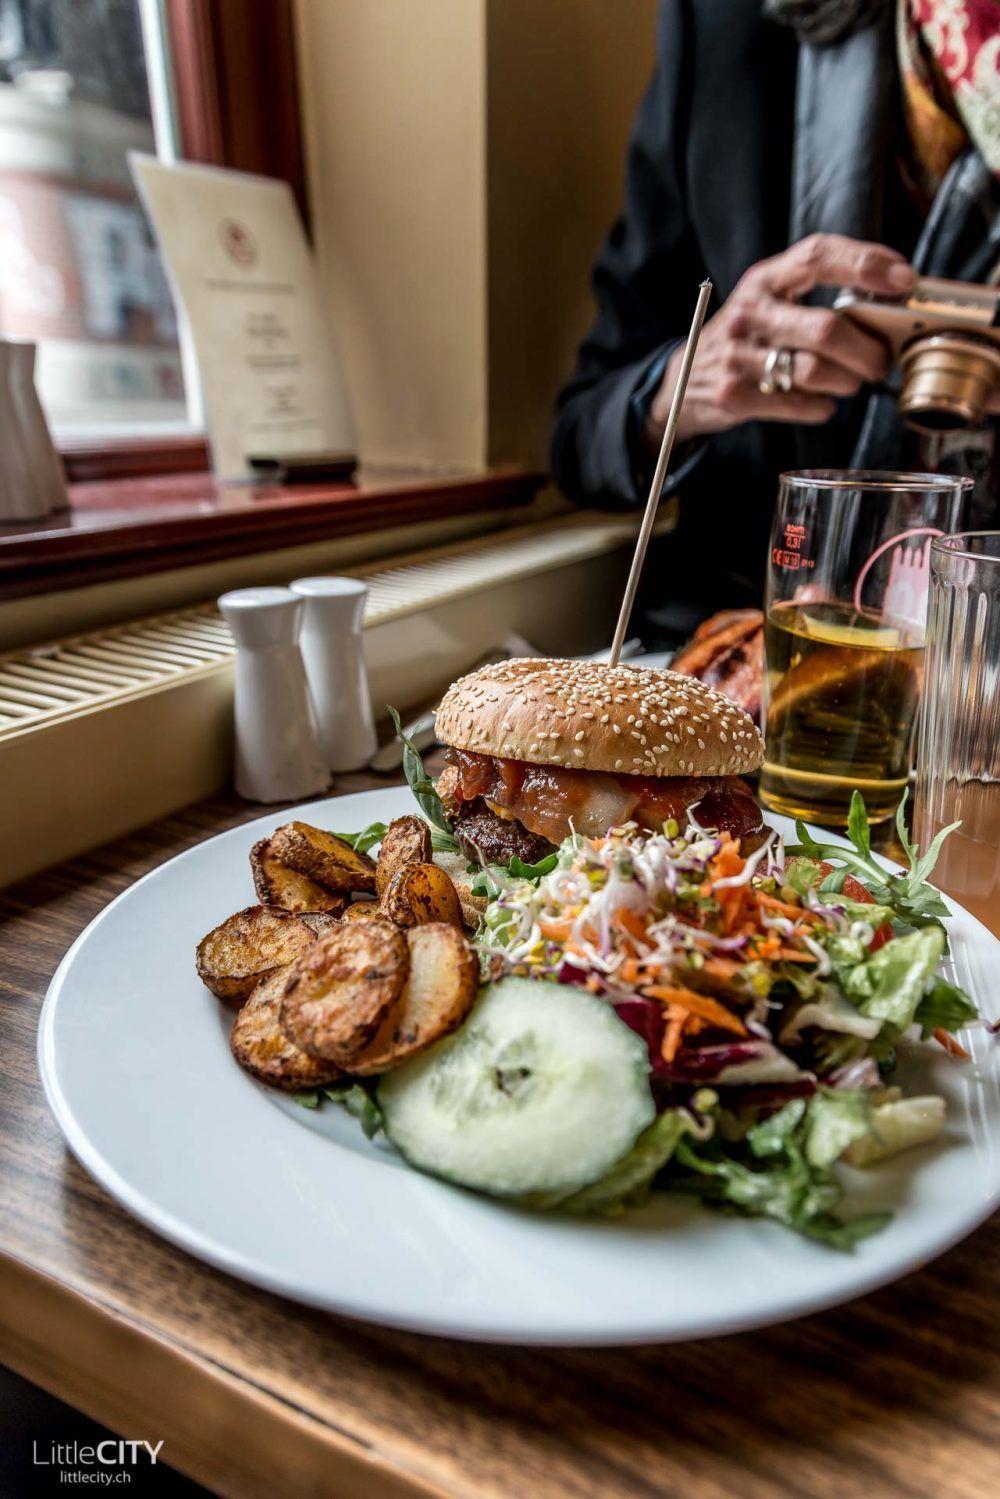 Hamburg Visithamburg In 2020 Hamburg Foodie Travel Restaurant Recipes